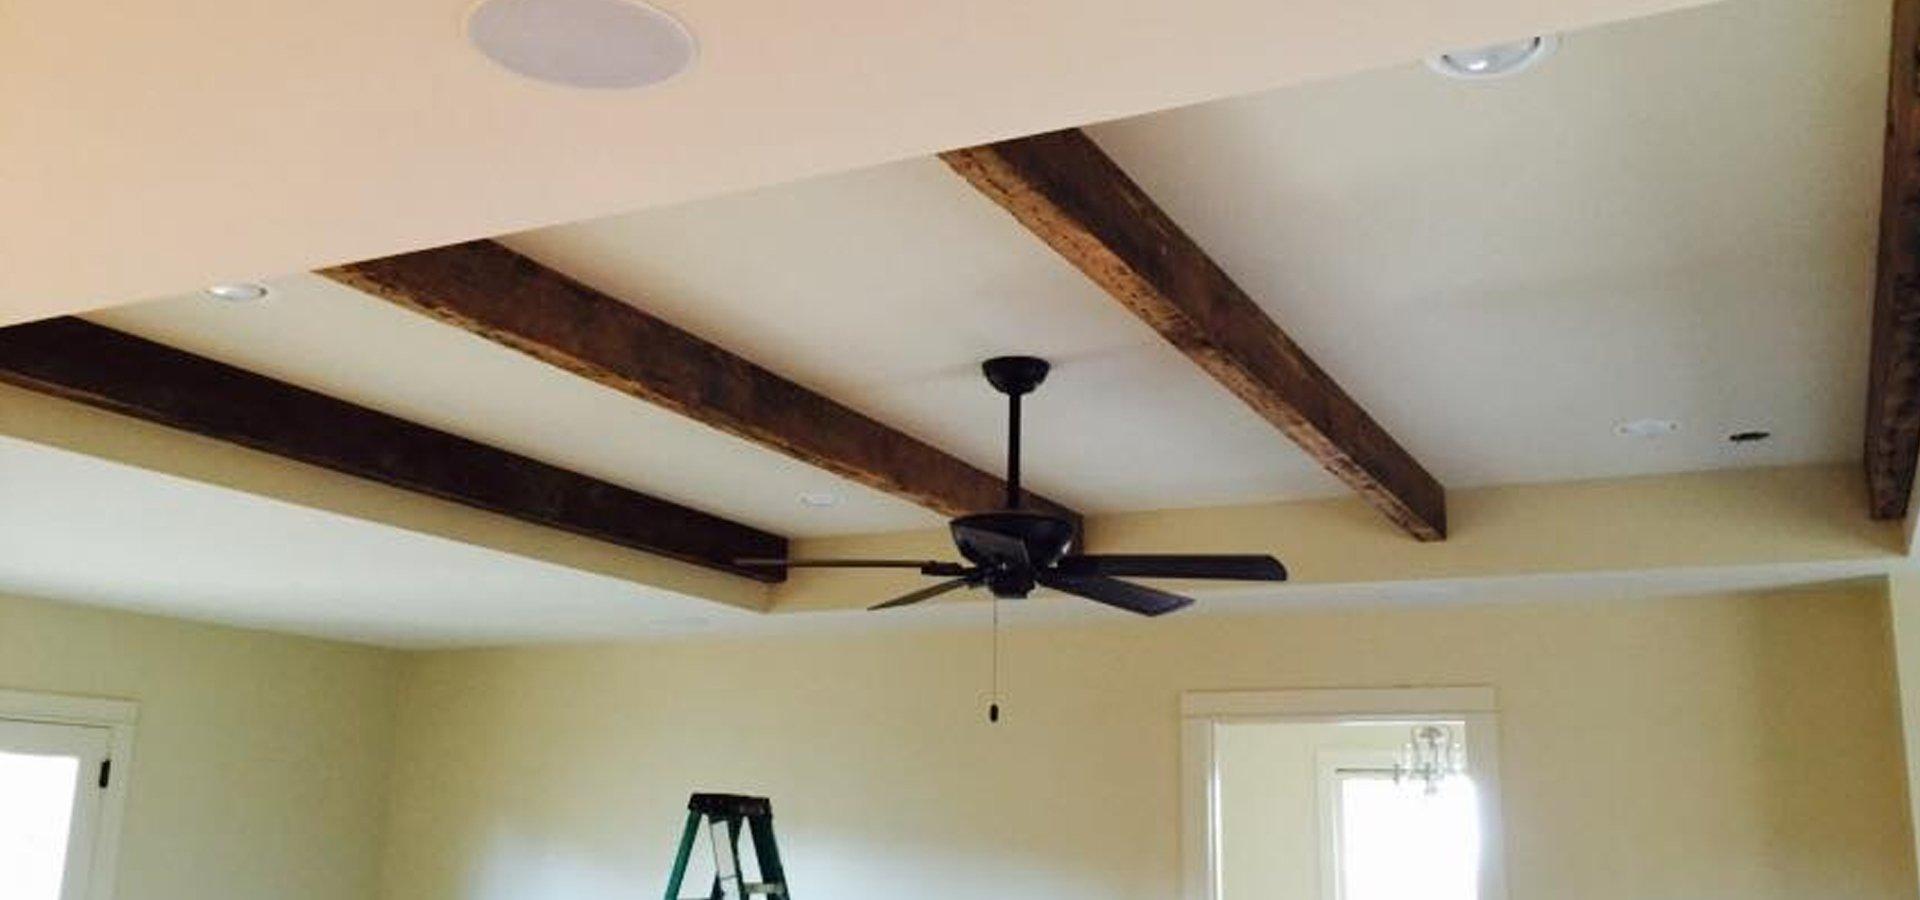 rts construction | home remodeling, kitchen remodel, bathroom